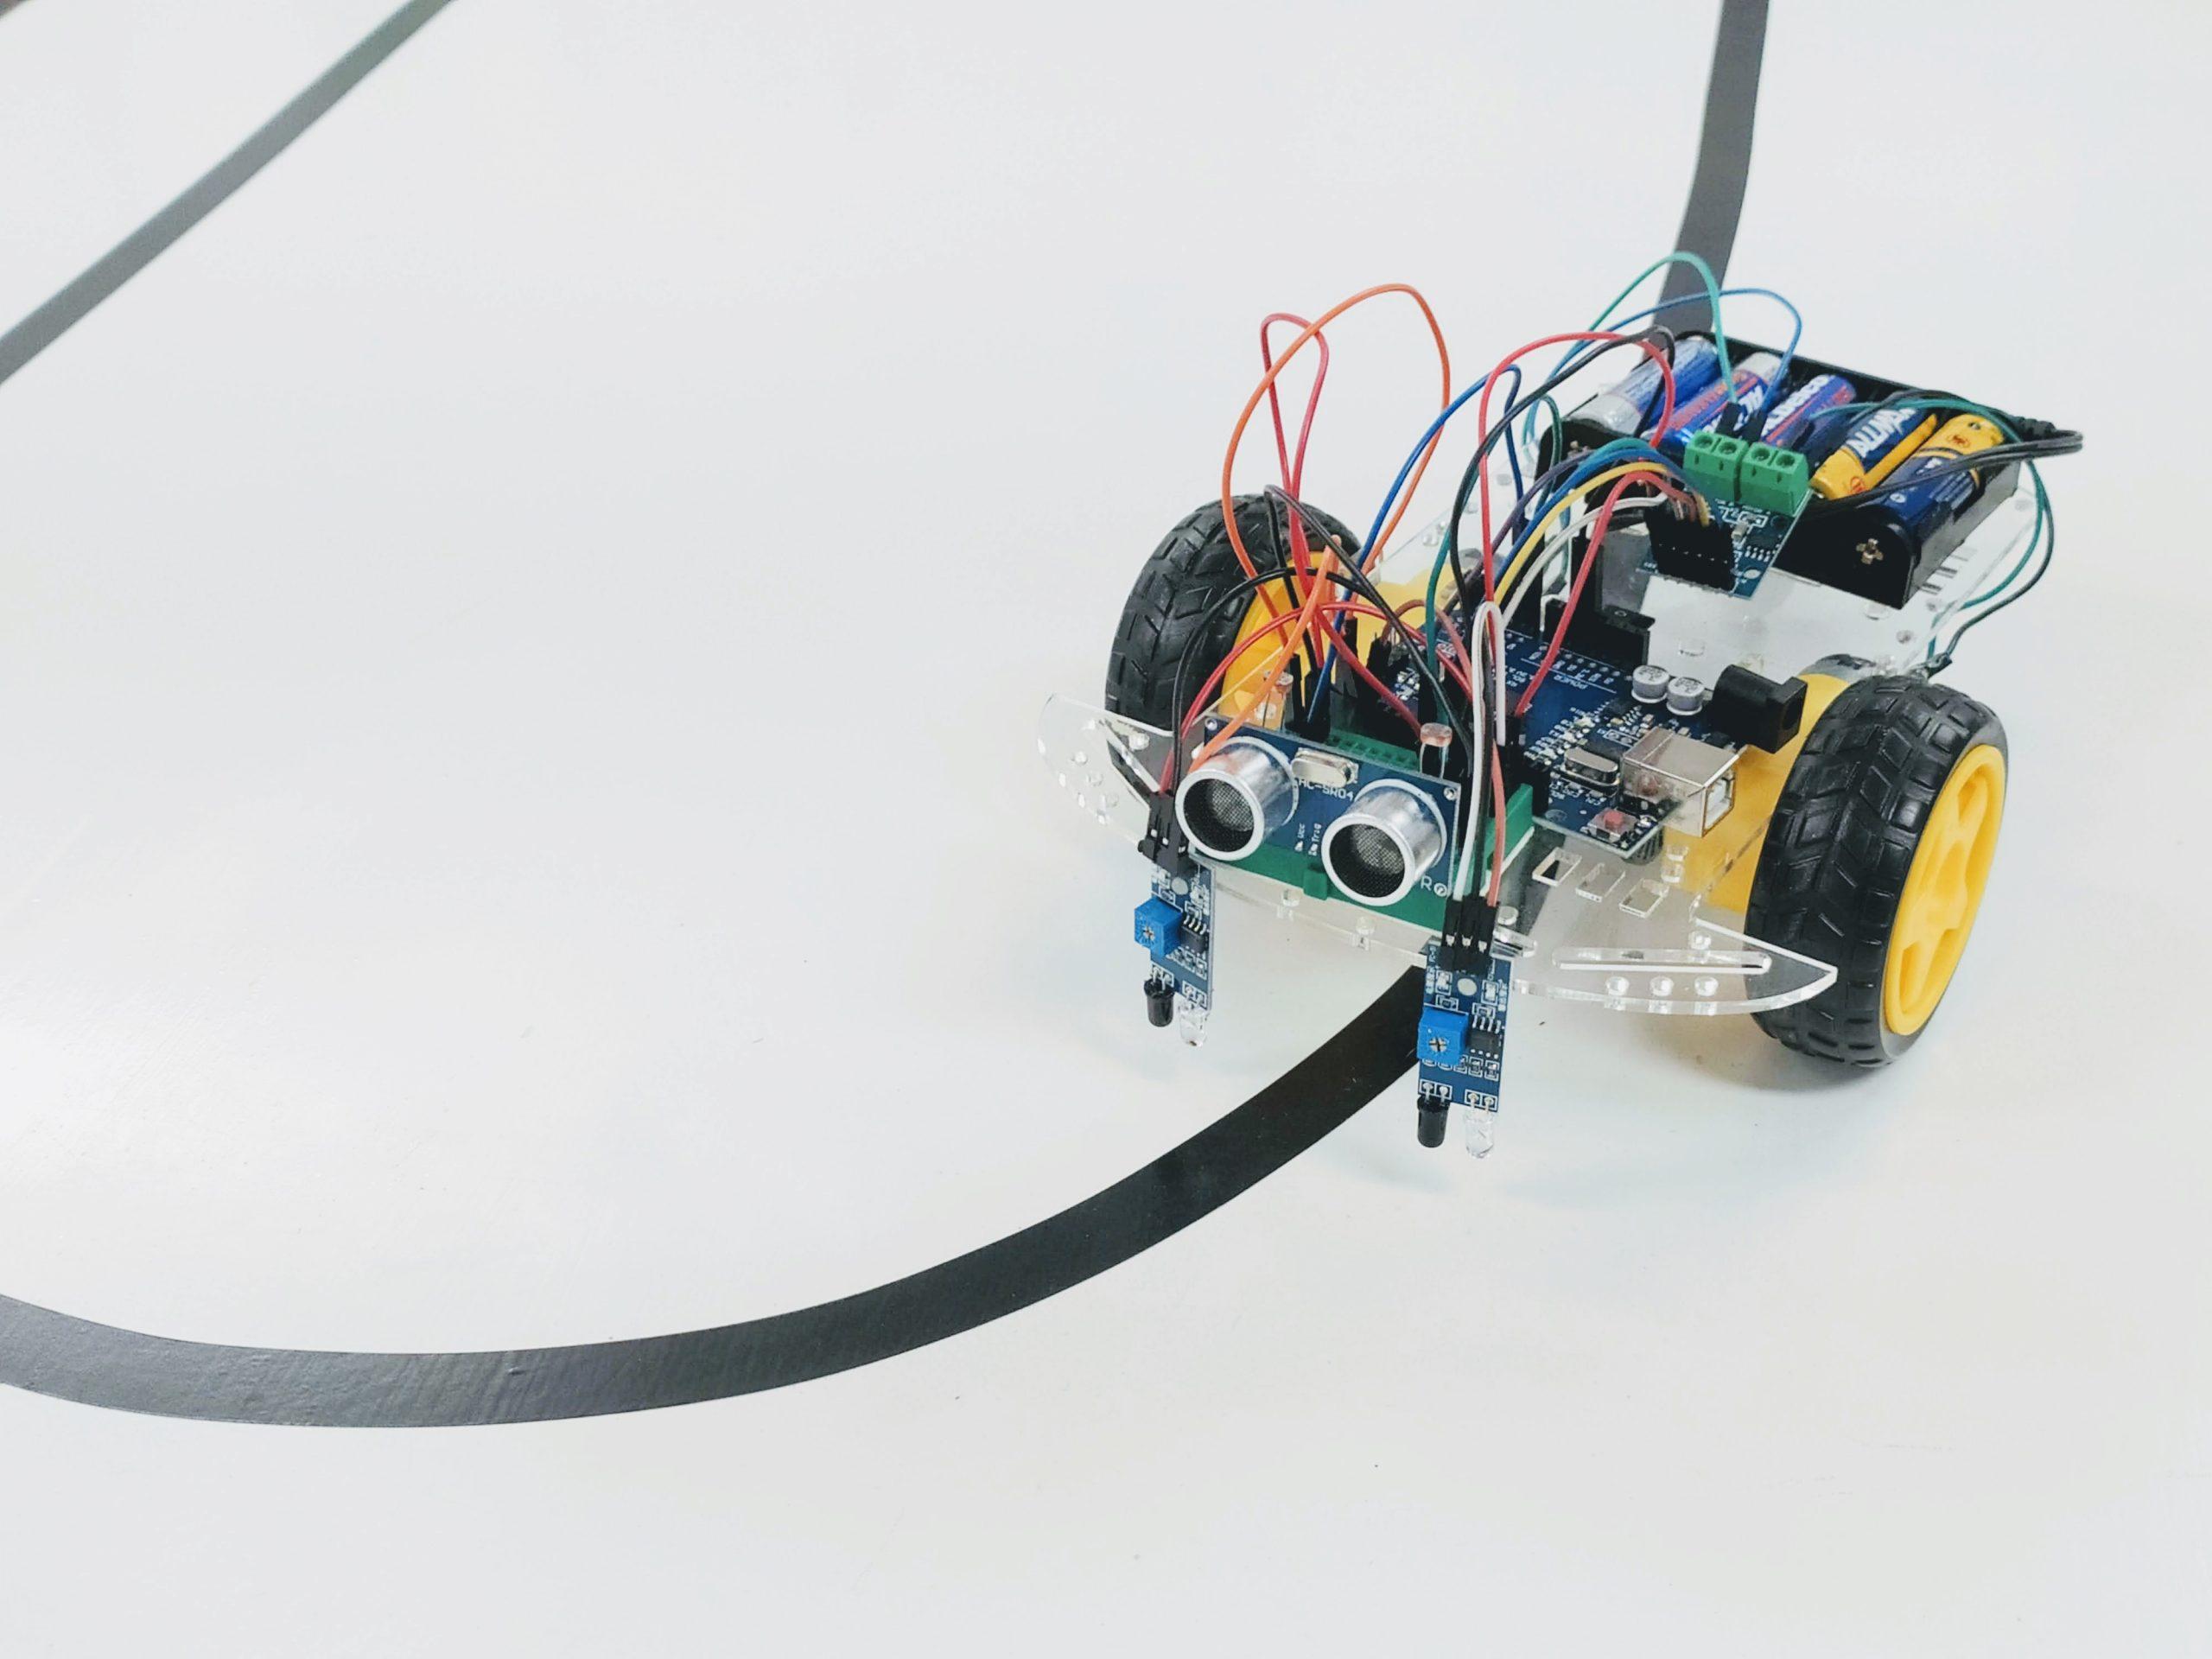 barnabas robotics rover